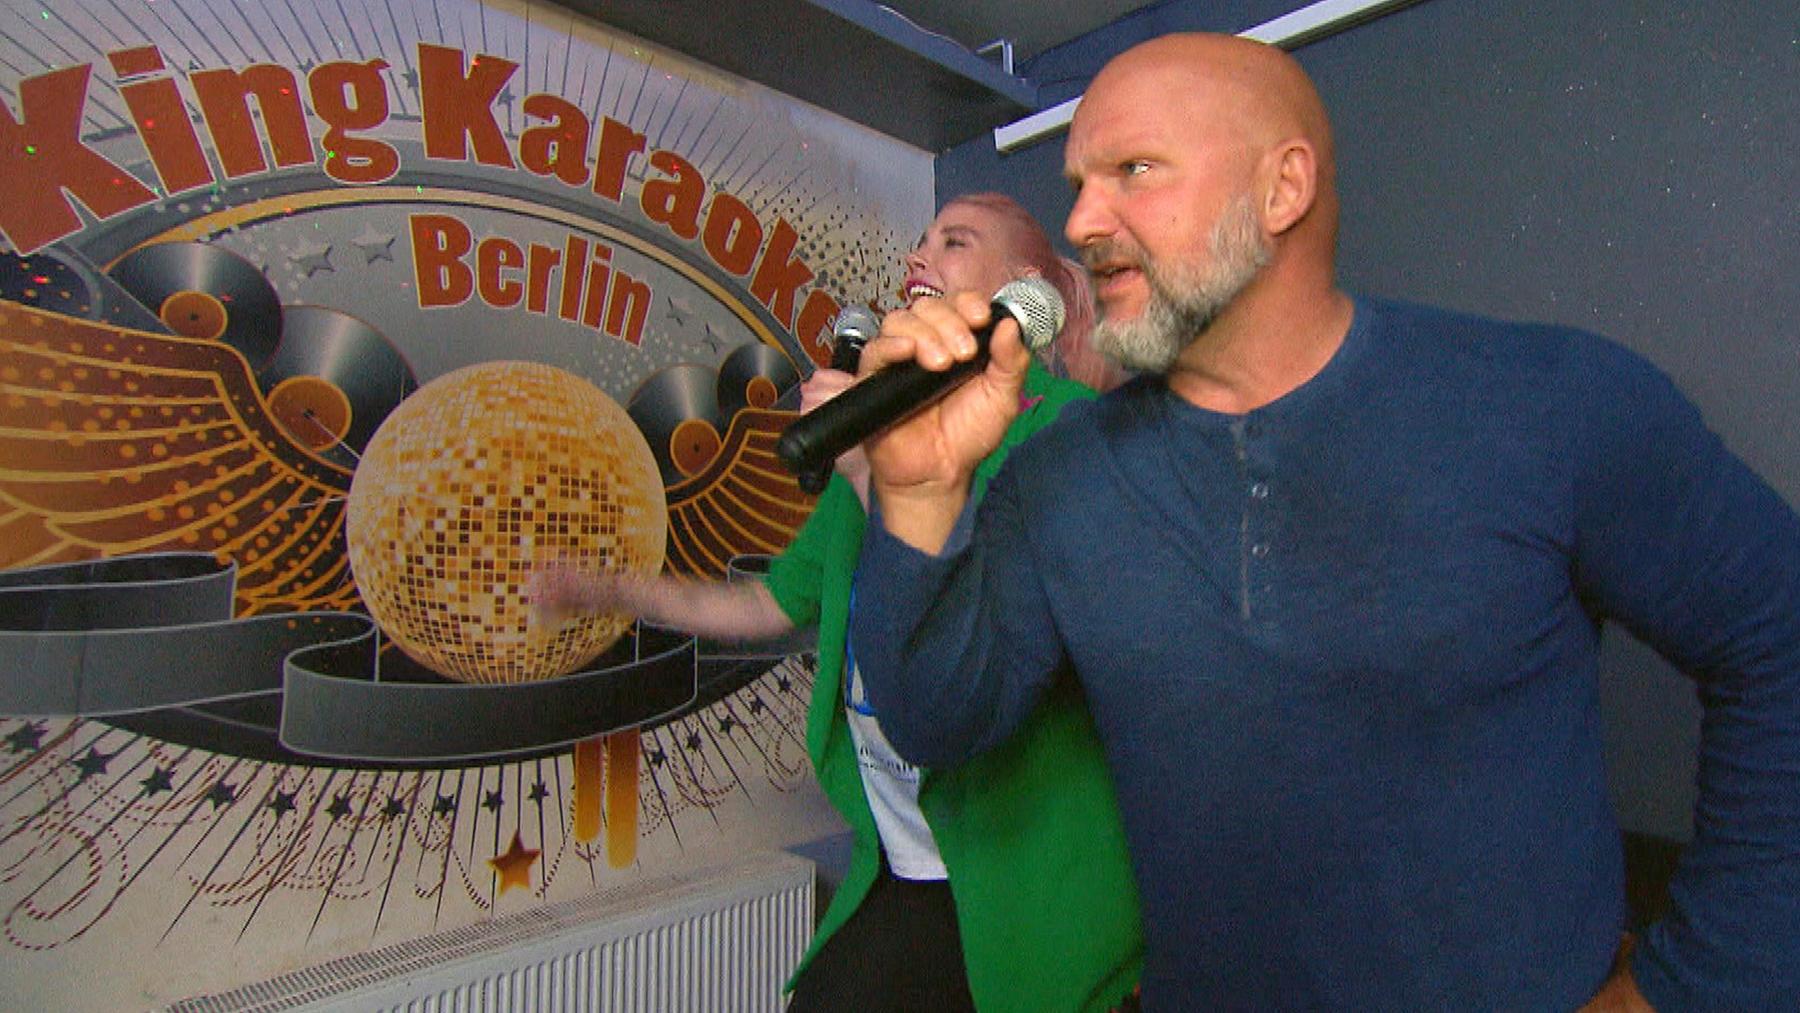 Berlin - Tag & Nacht (Folge 2556)